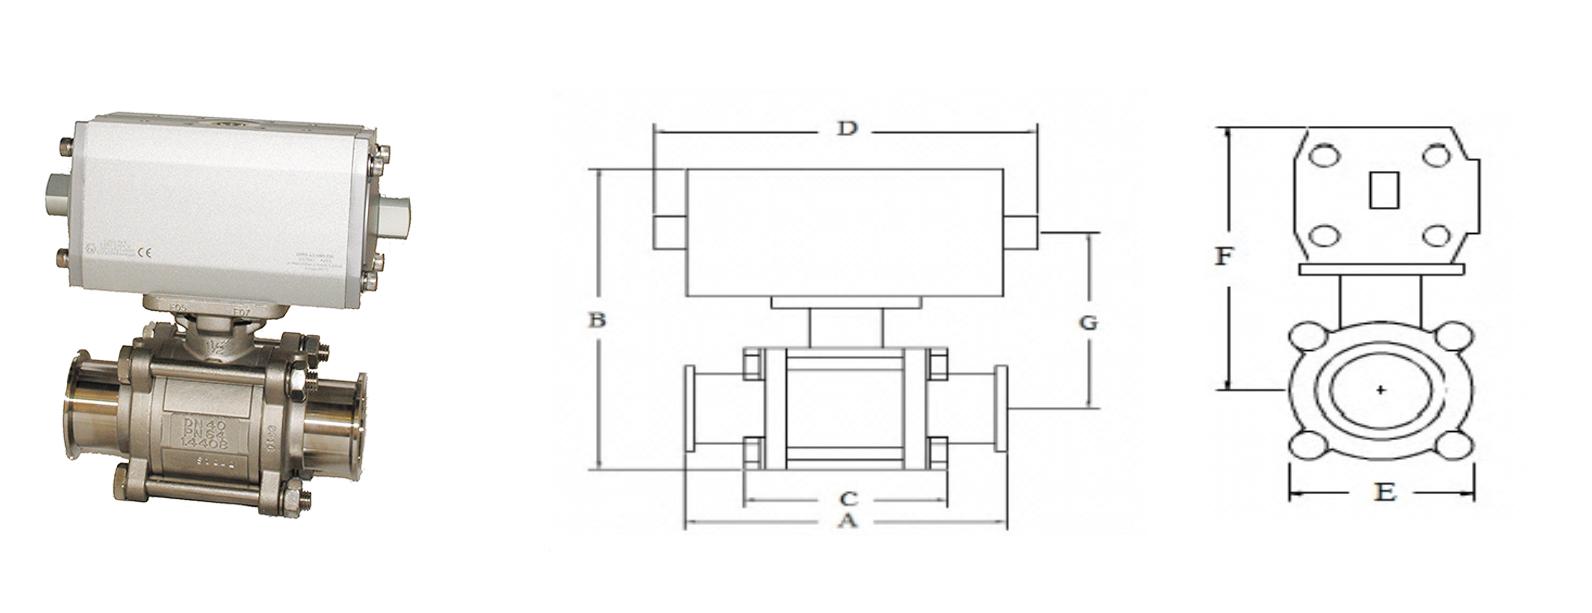 ball-valve-with-dwg.jpg